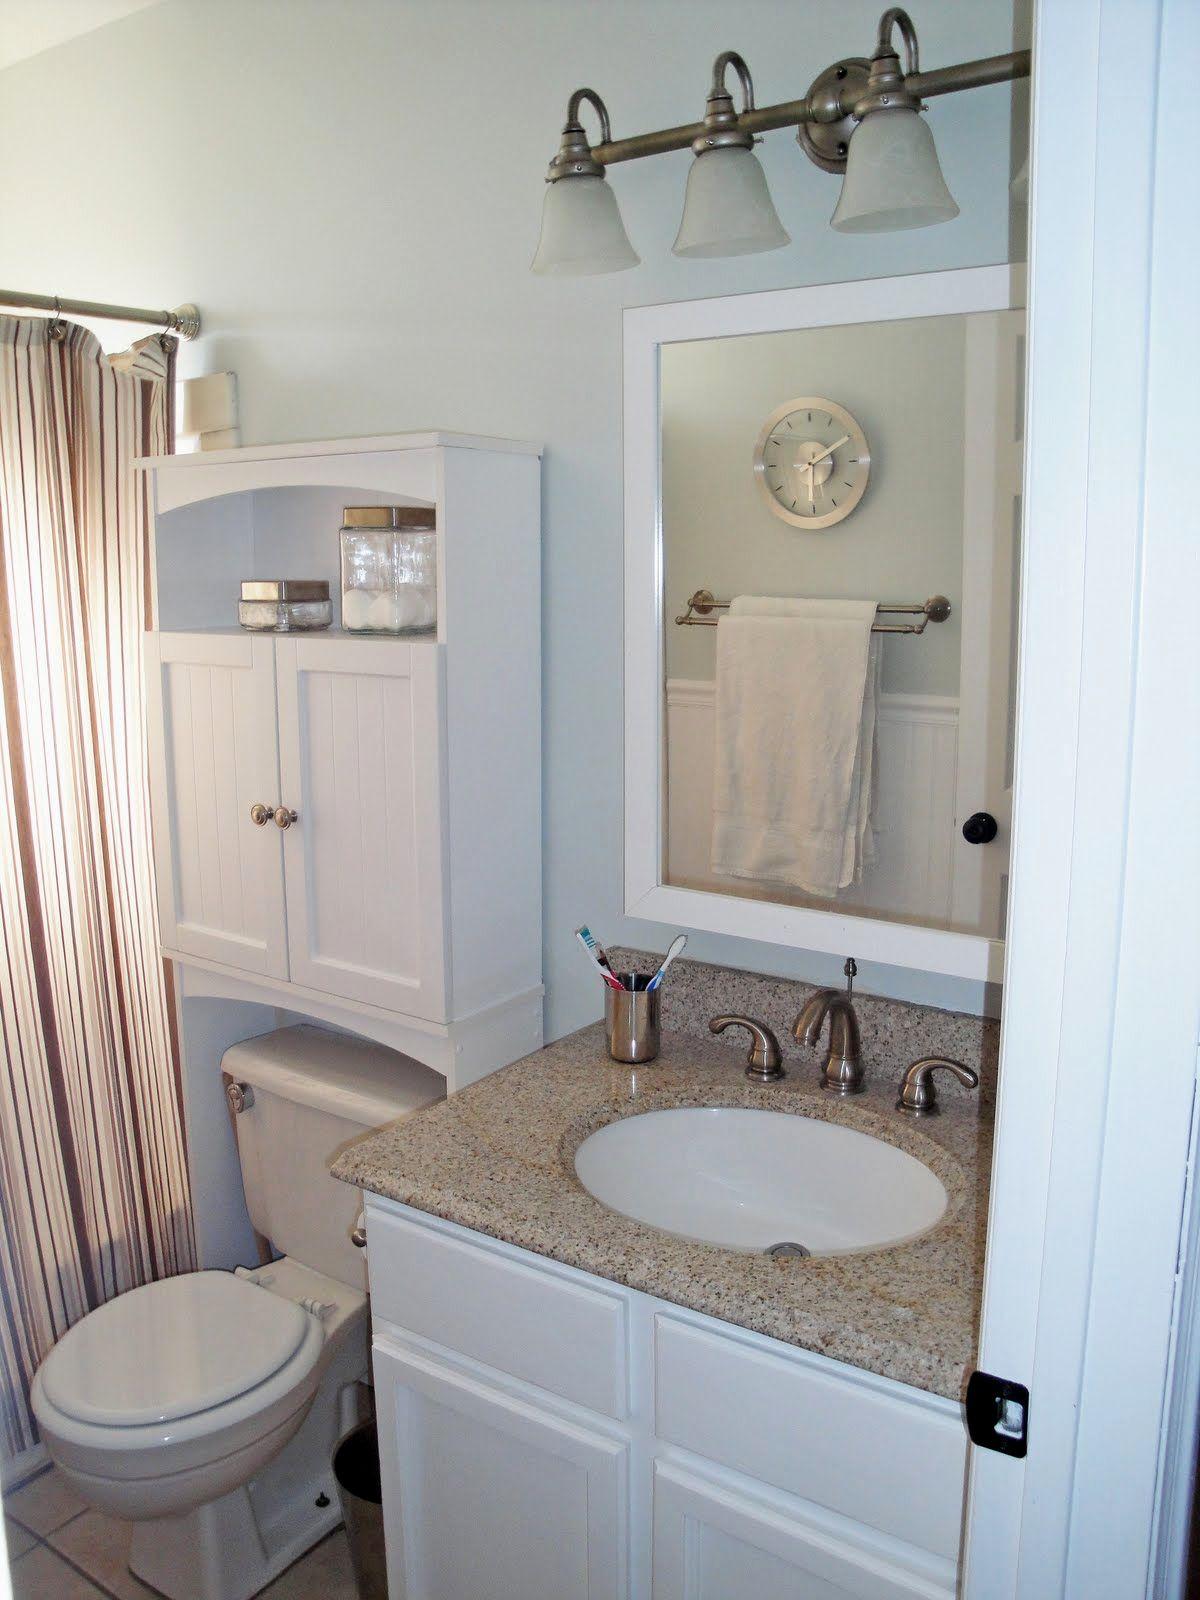 lovely small bathroom vanity ideas-Beautiful Small Bathroom Vanity Décor